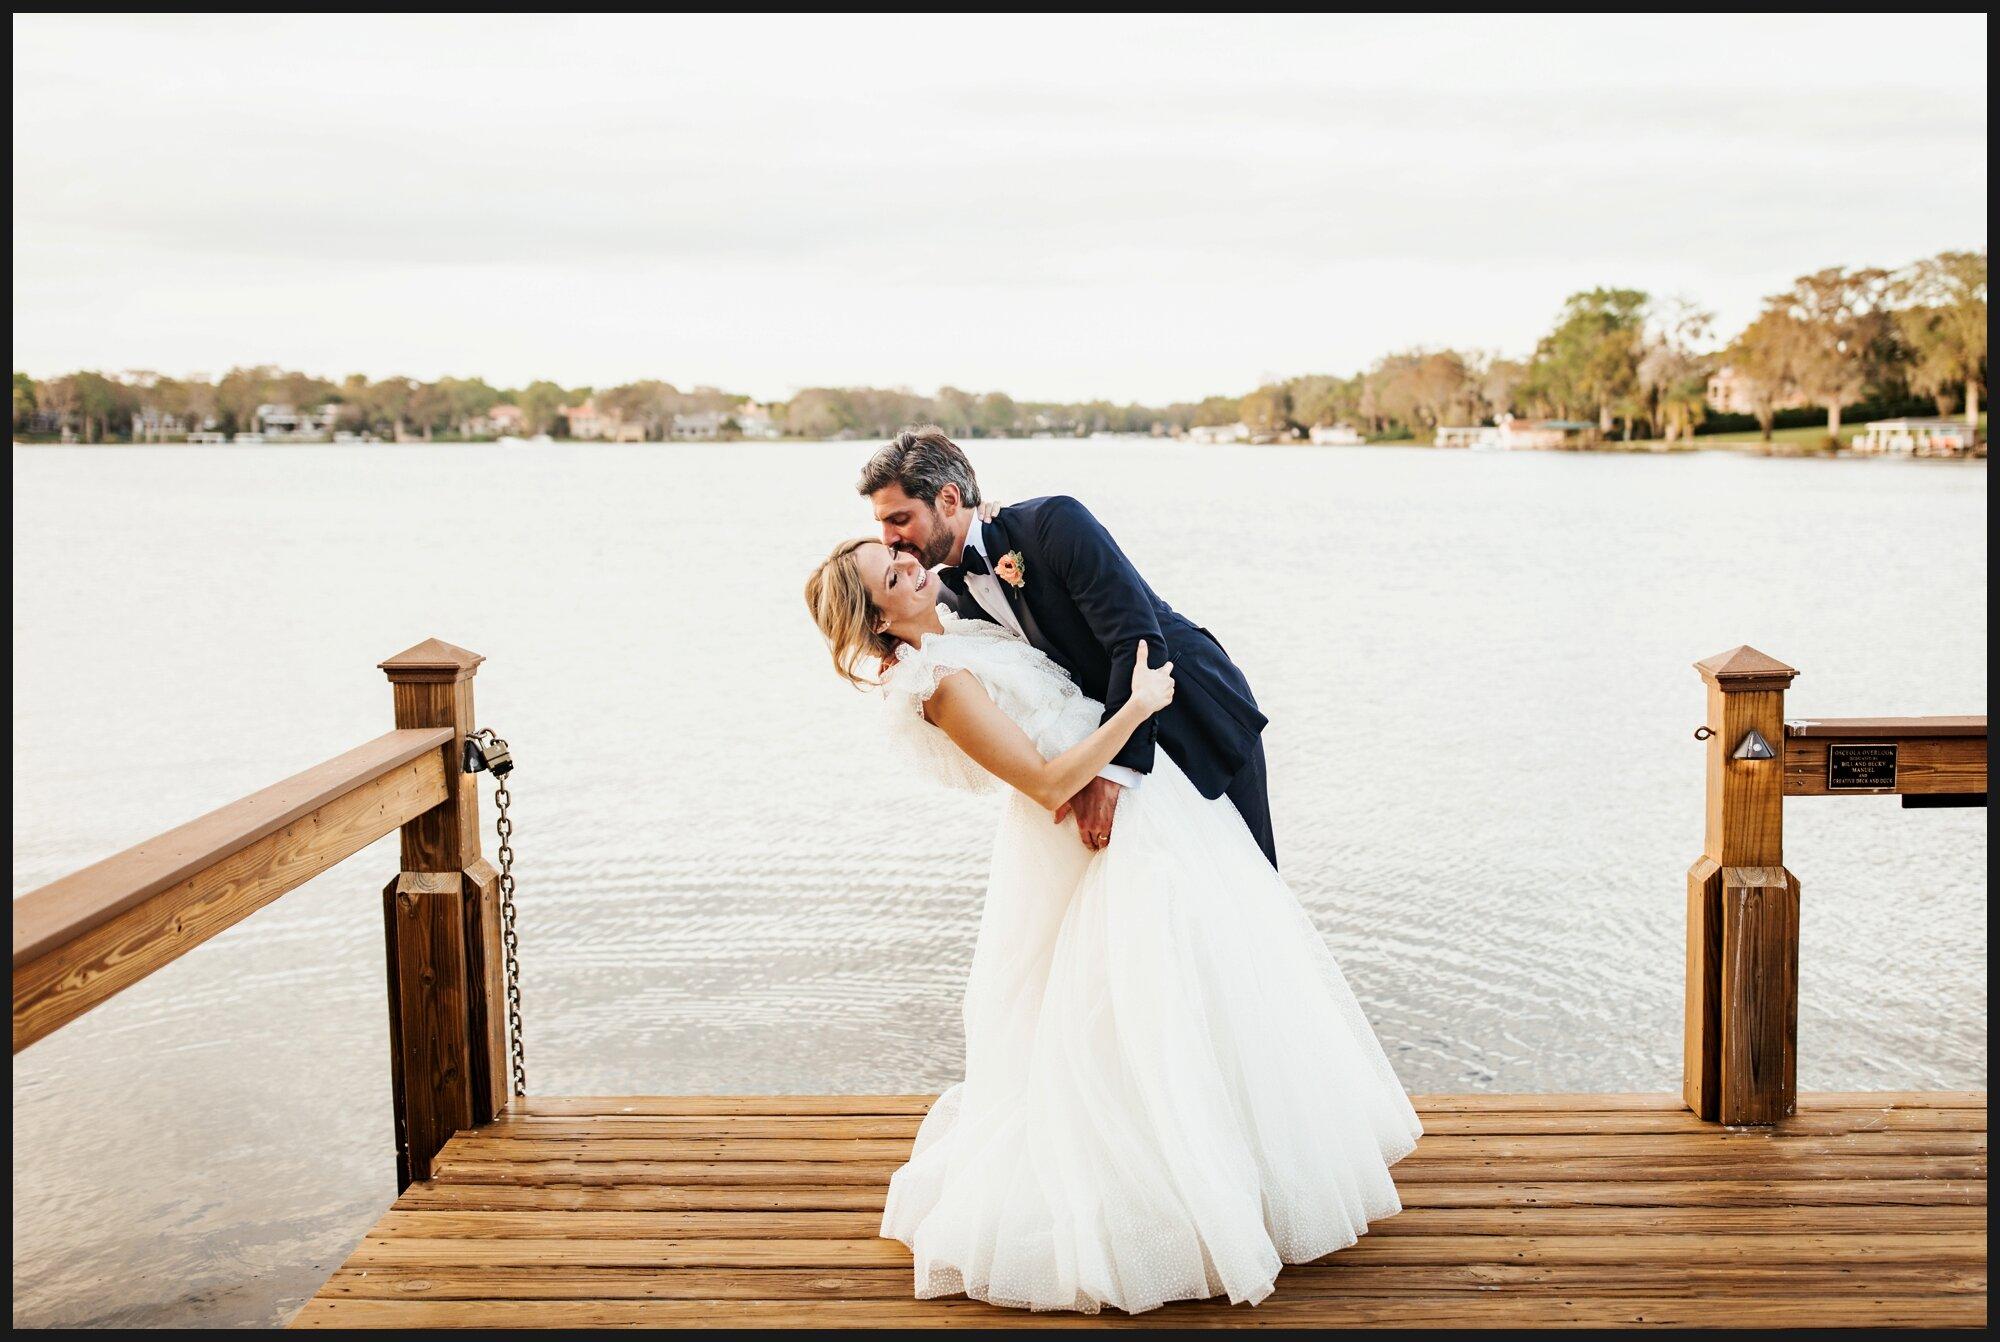 Orlando-Wedding-Photographer-destination-wedding-photographer-florida-wedding-photographer-hawaii-wedding-photographer_0762.jpg